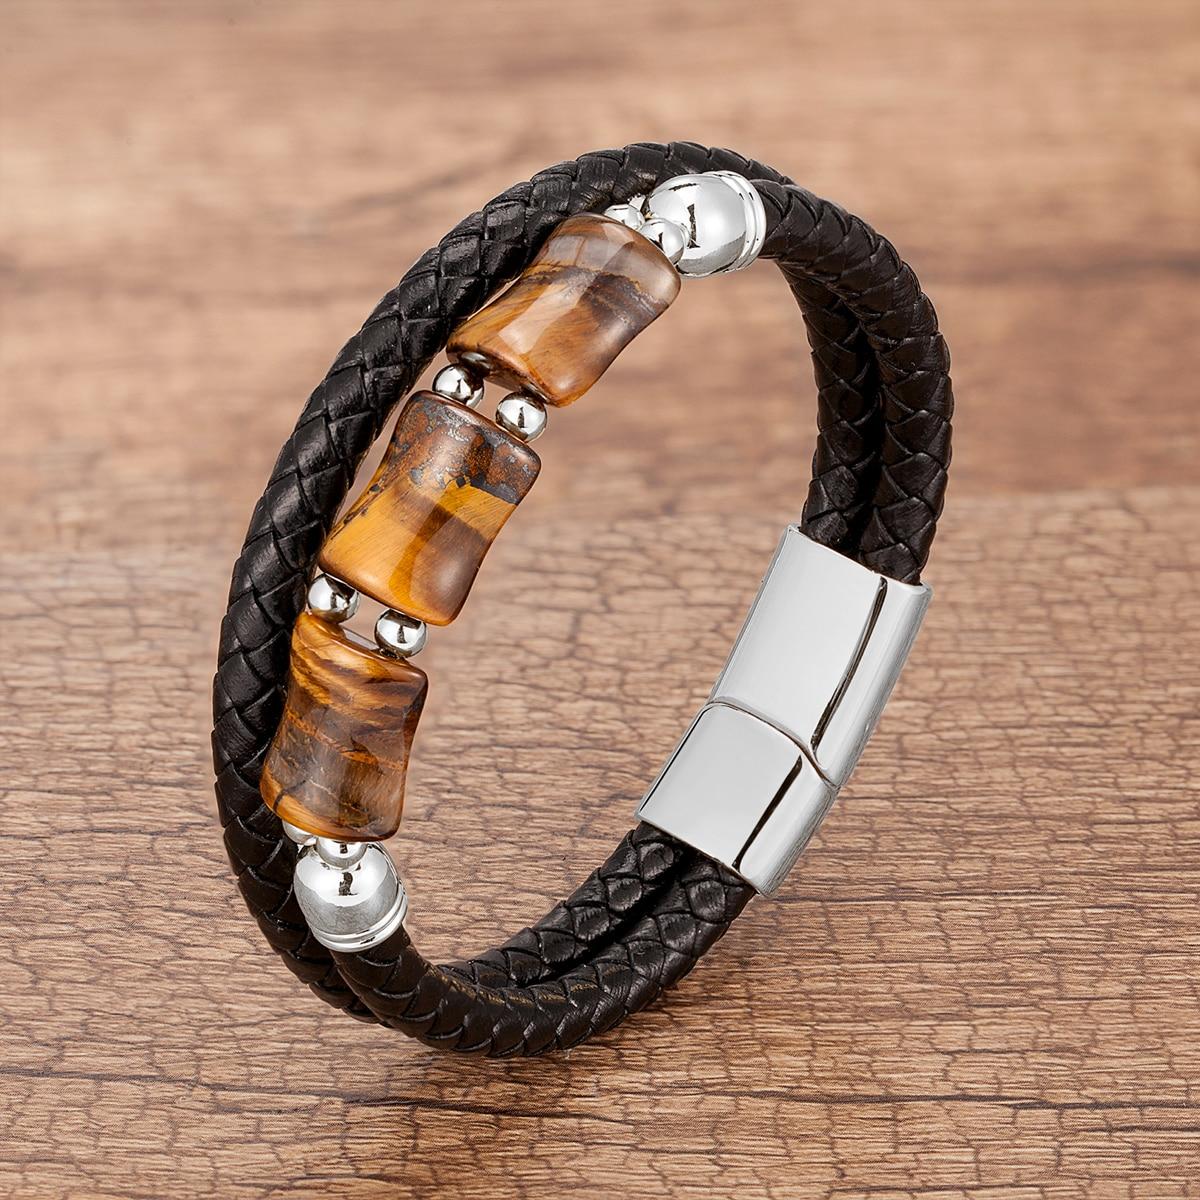 Tiger eye and leather bracelet